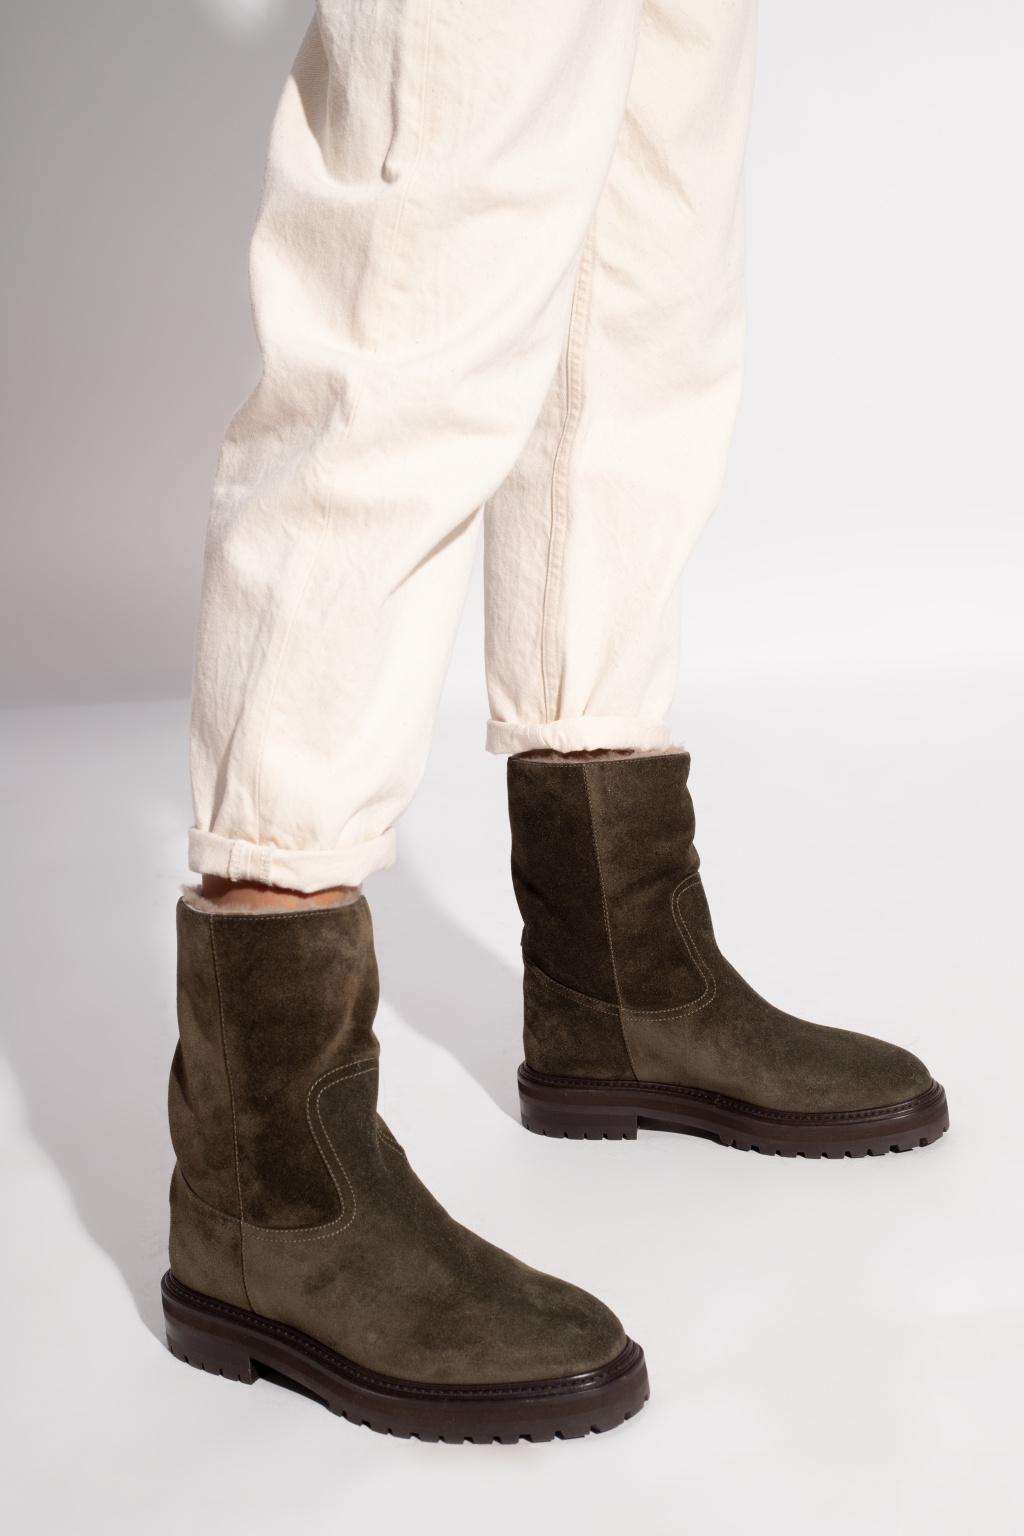 Jimmy Choo 'Yari' suede boots